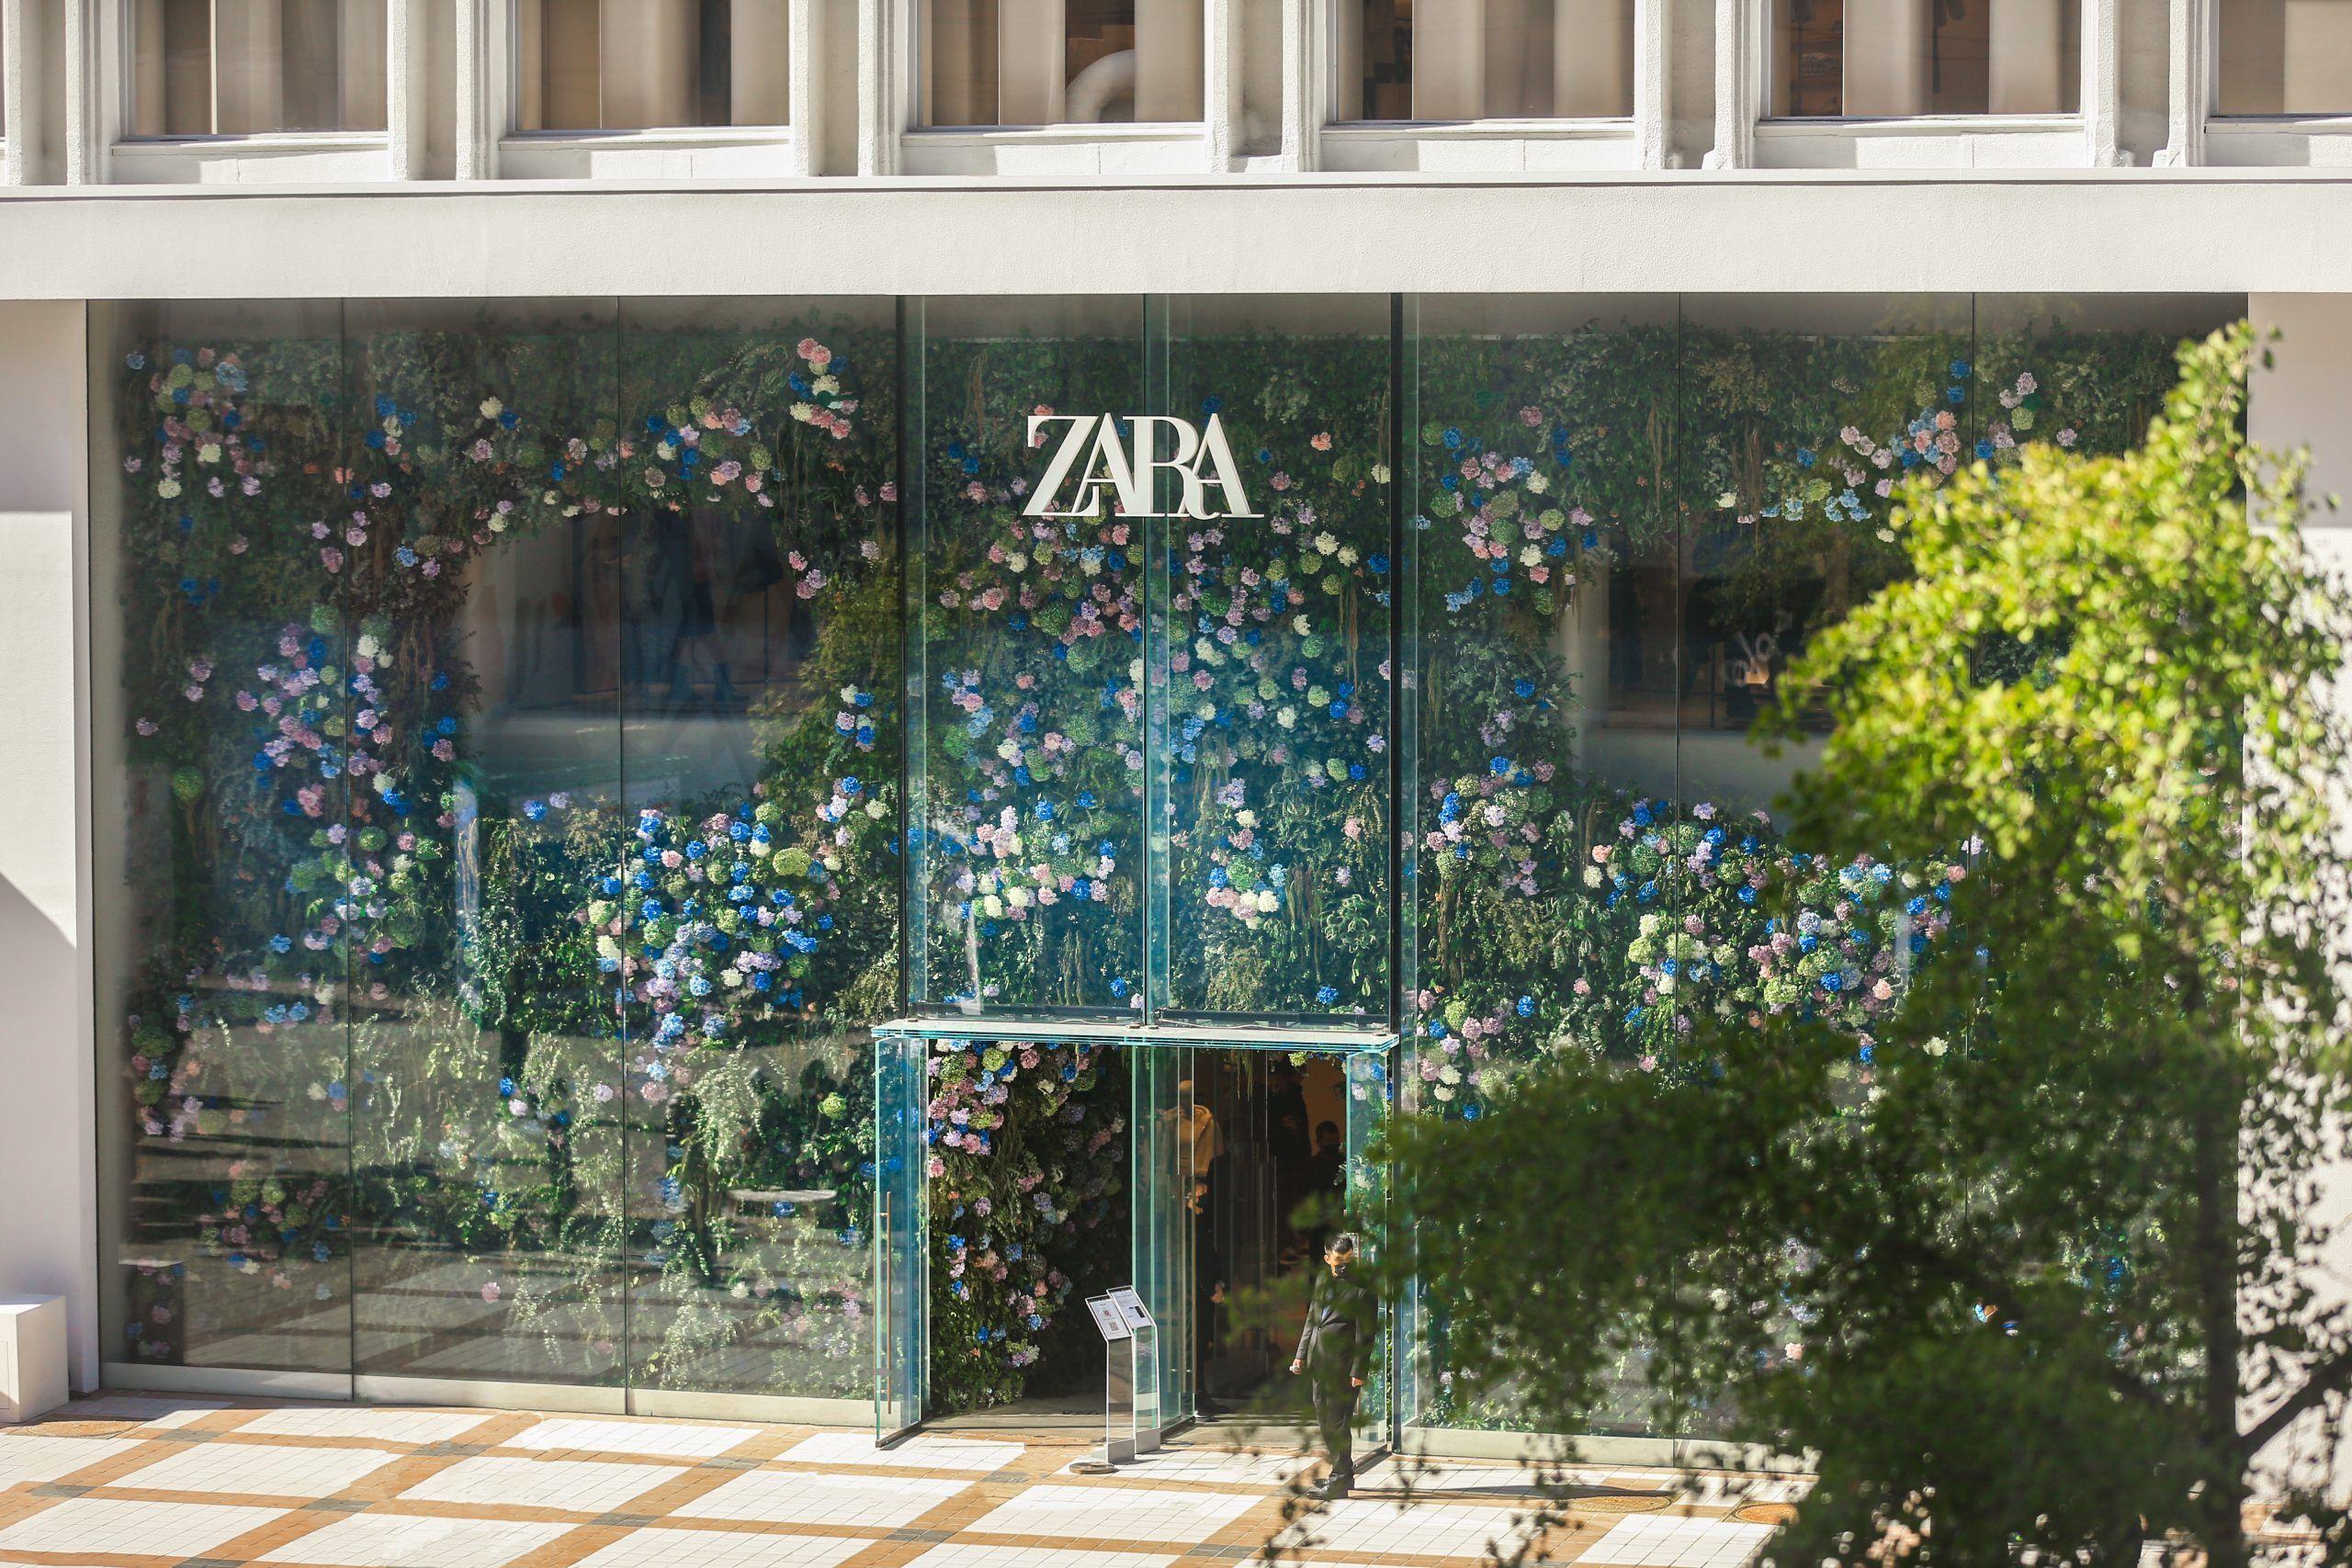 Évènement: Zara